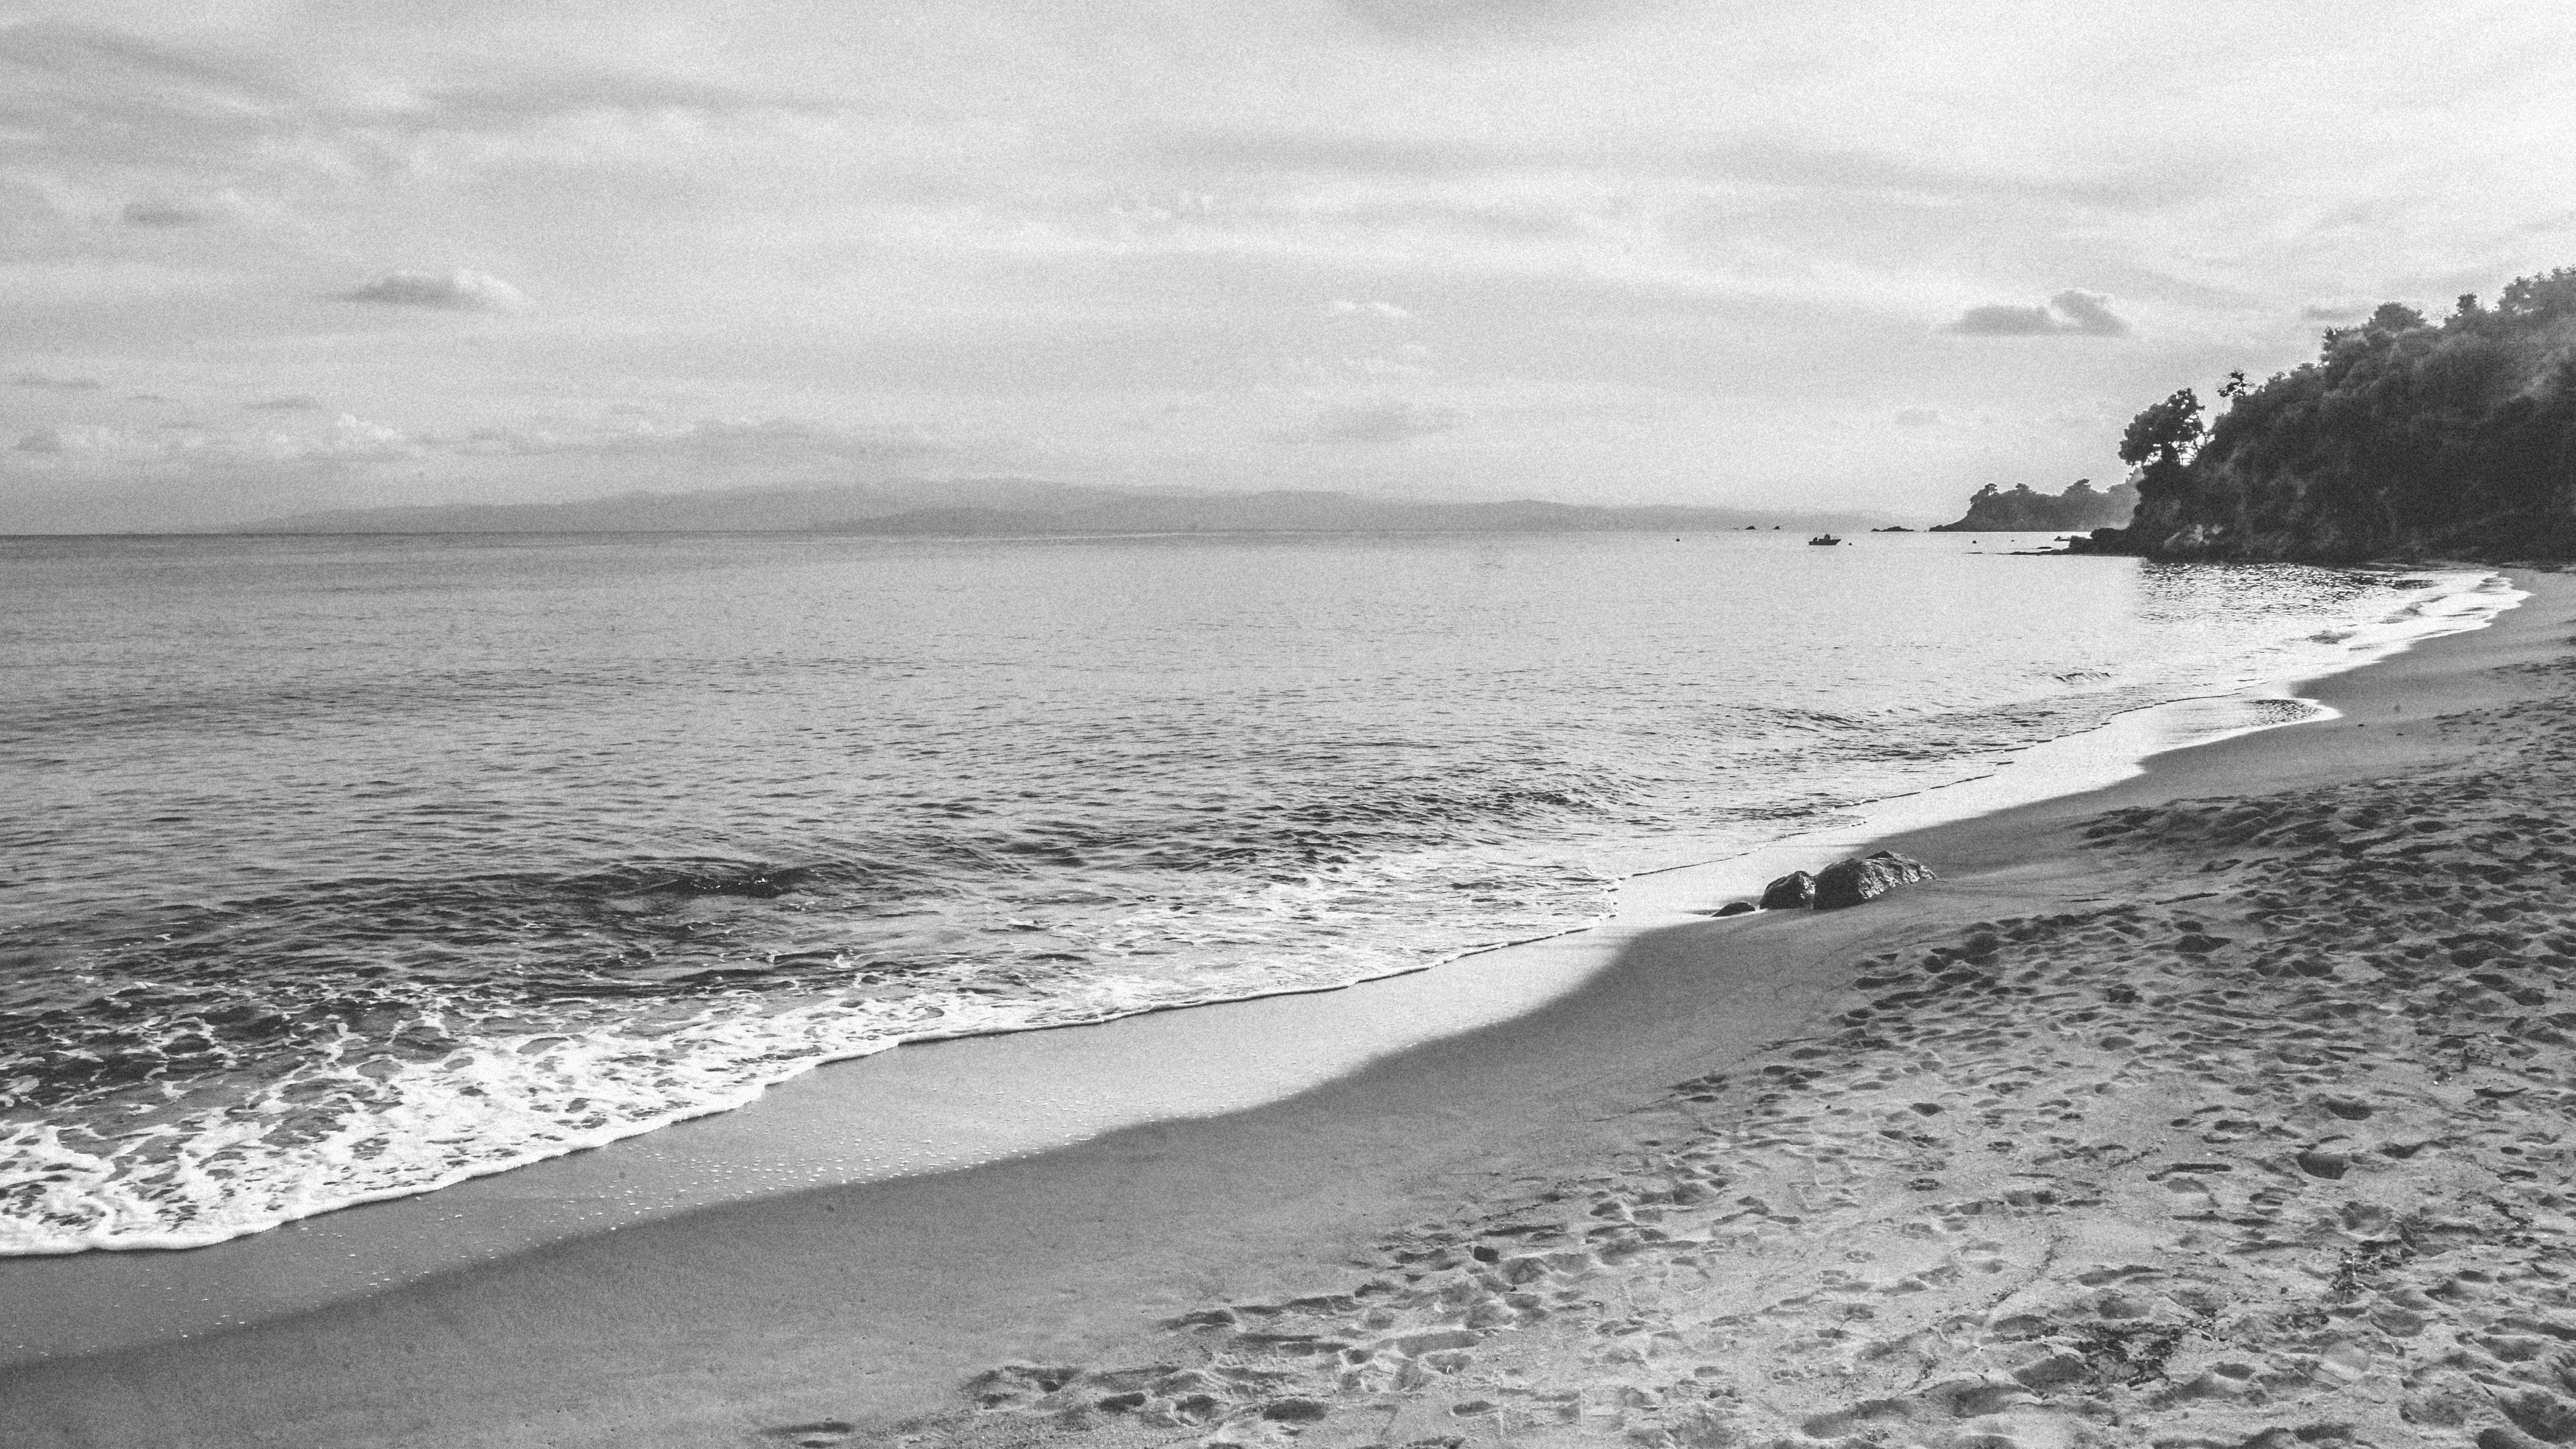 Картинки море солнце пляж черно белые